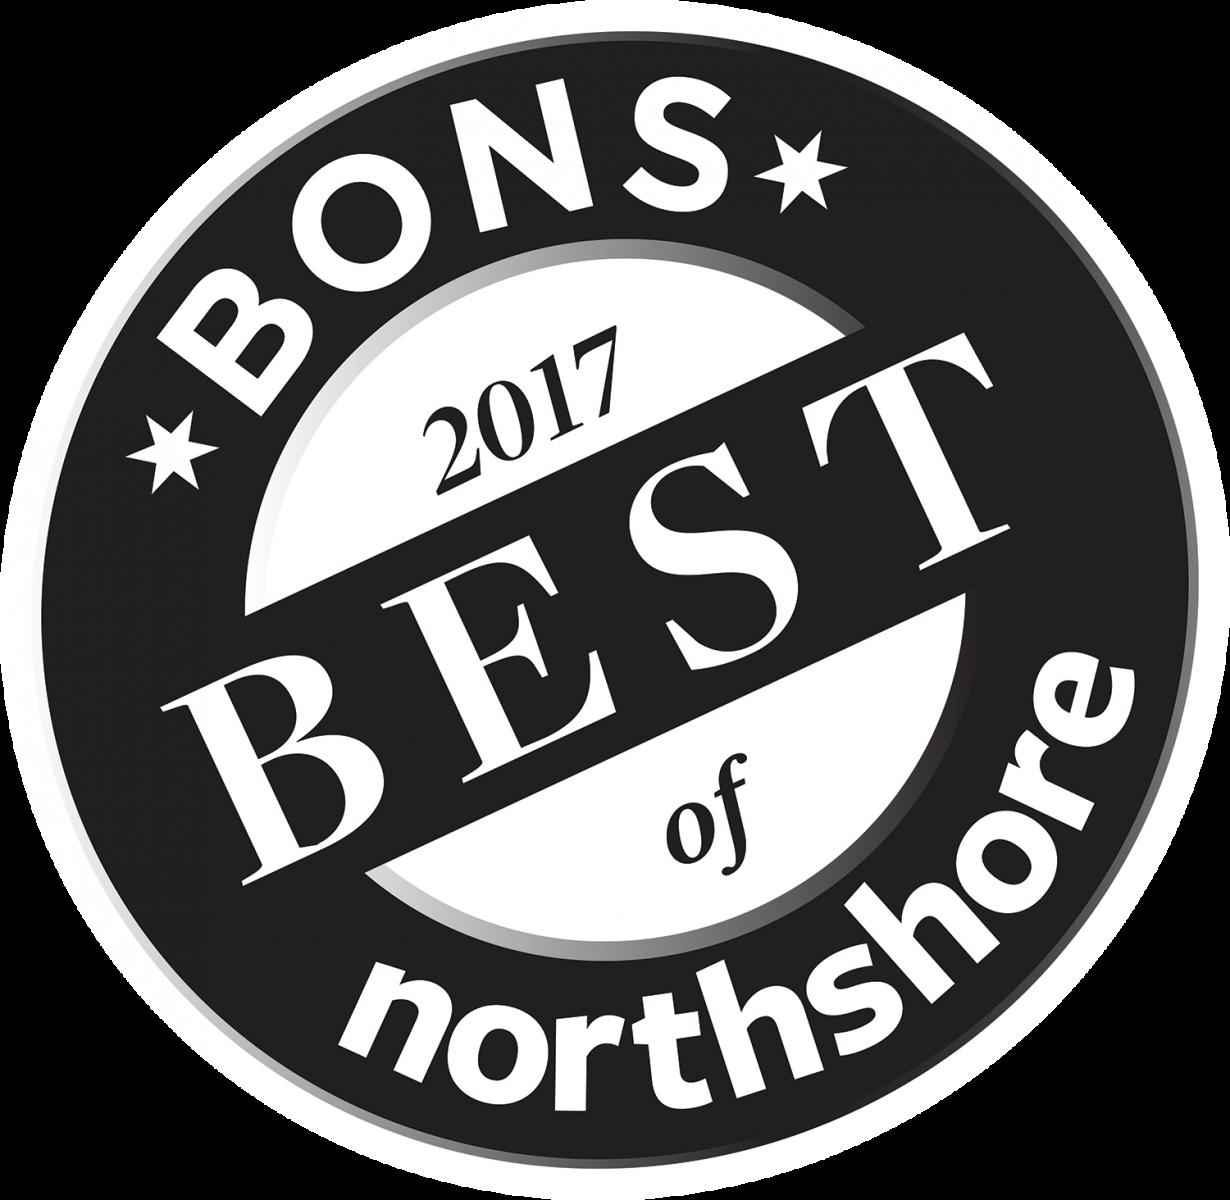 BONS 2017